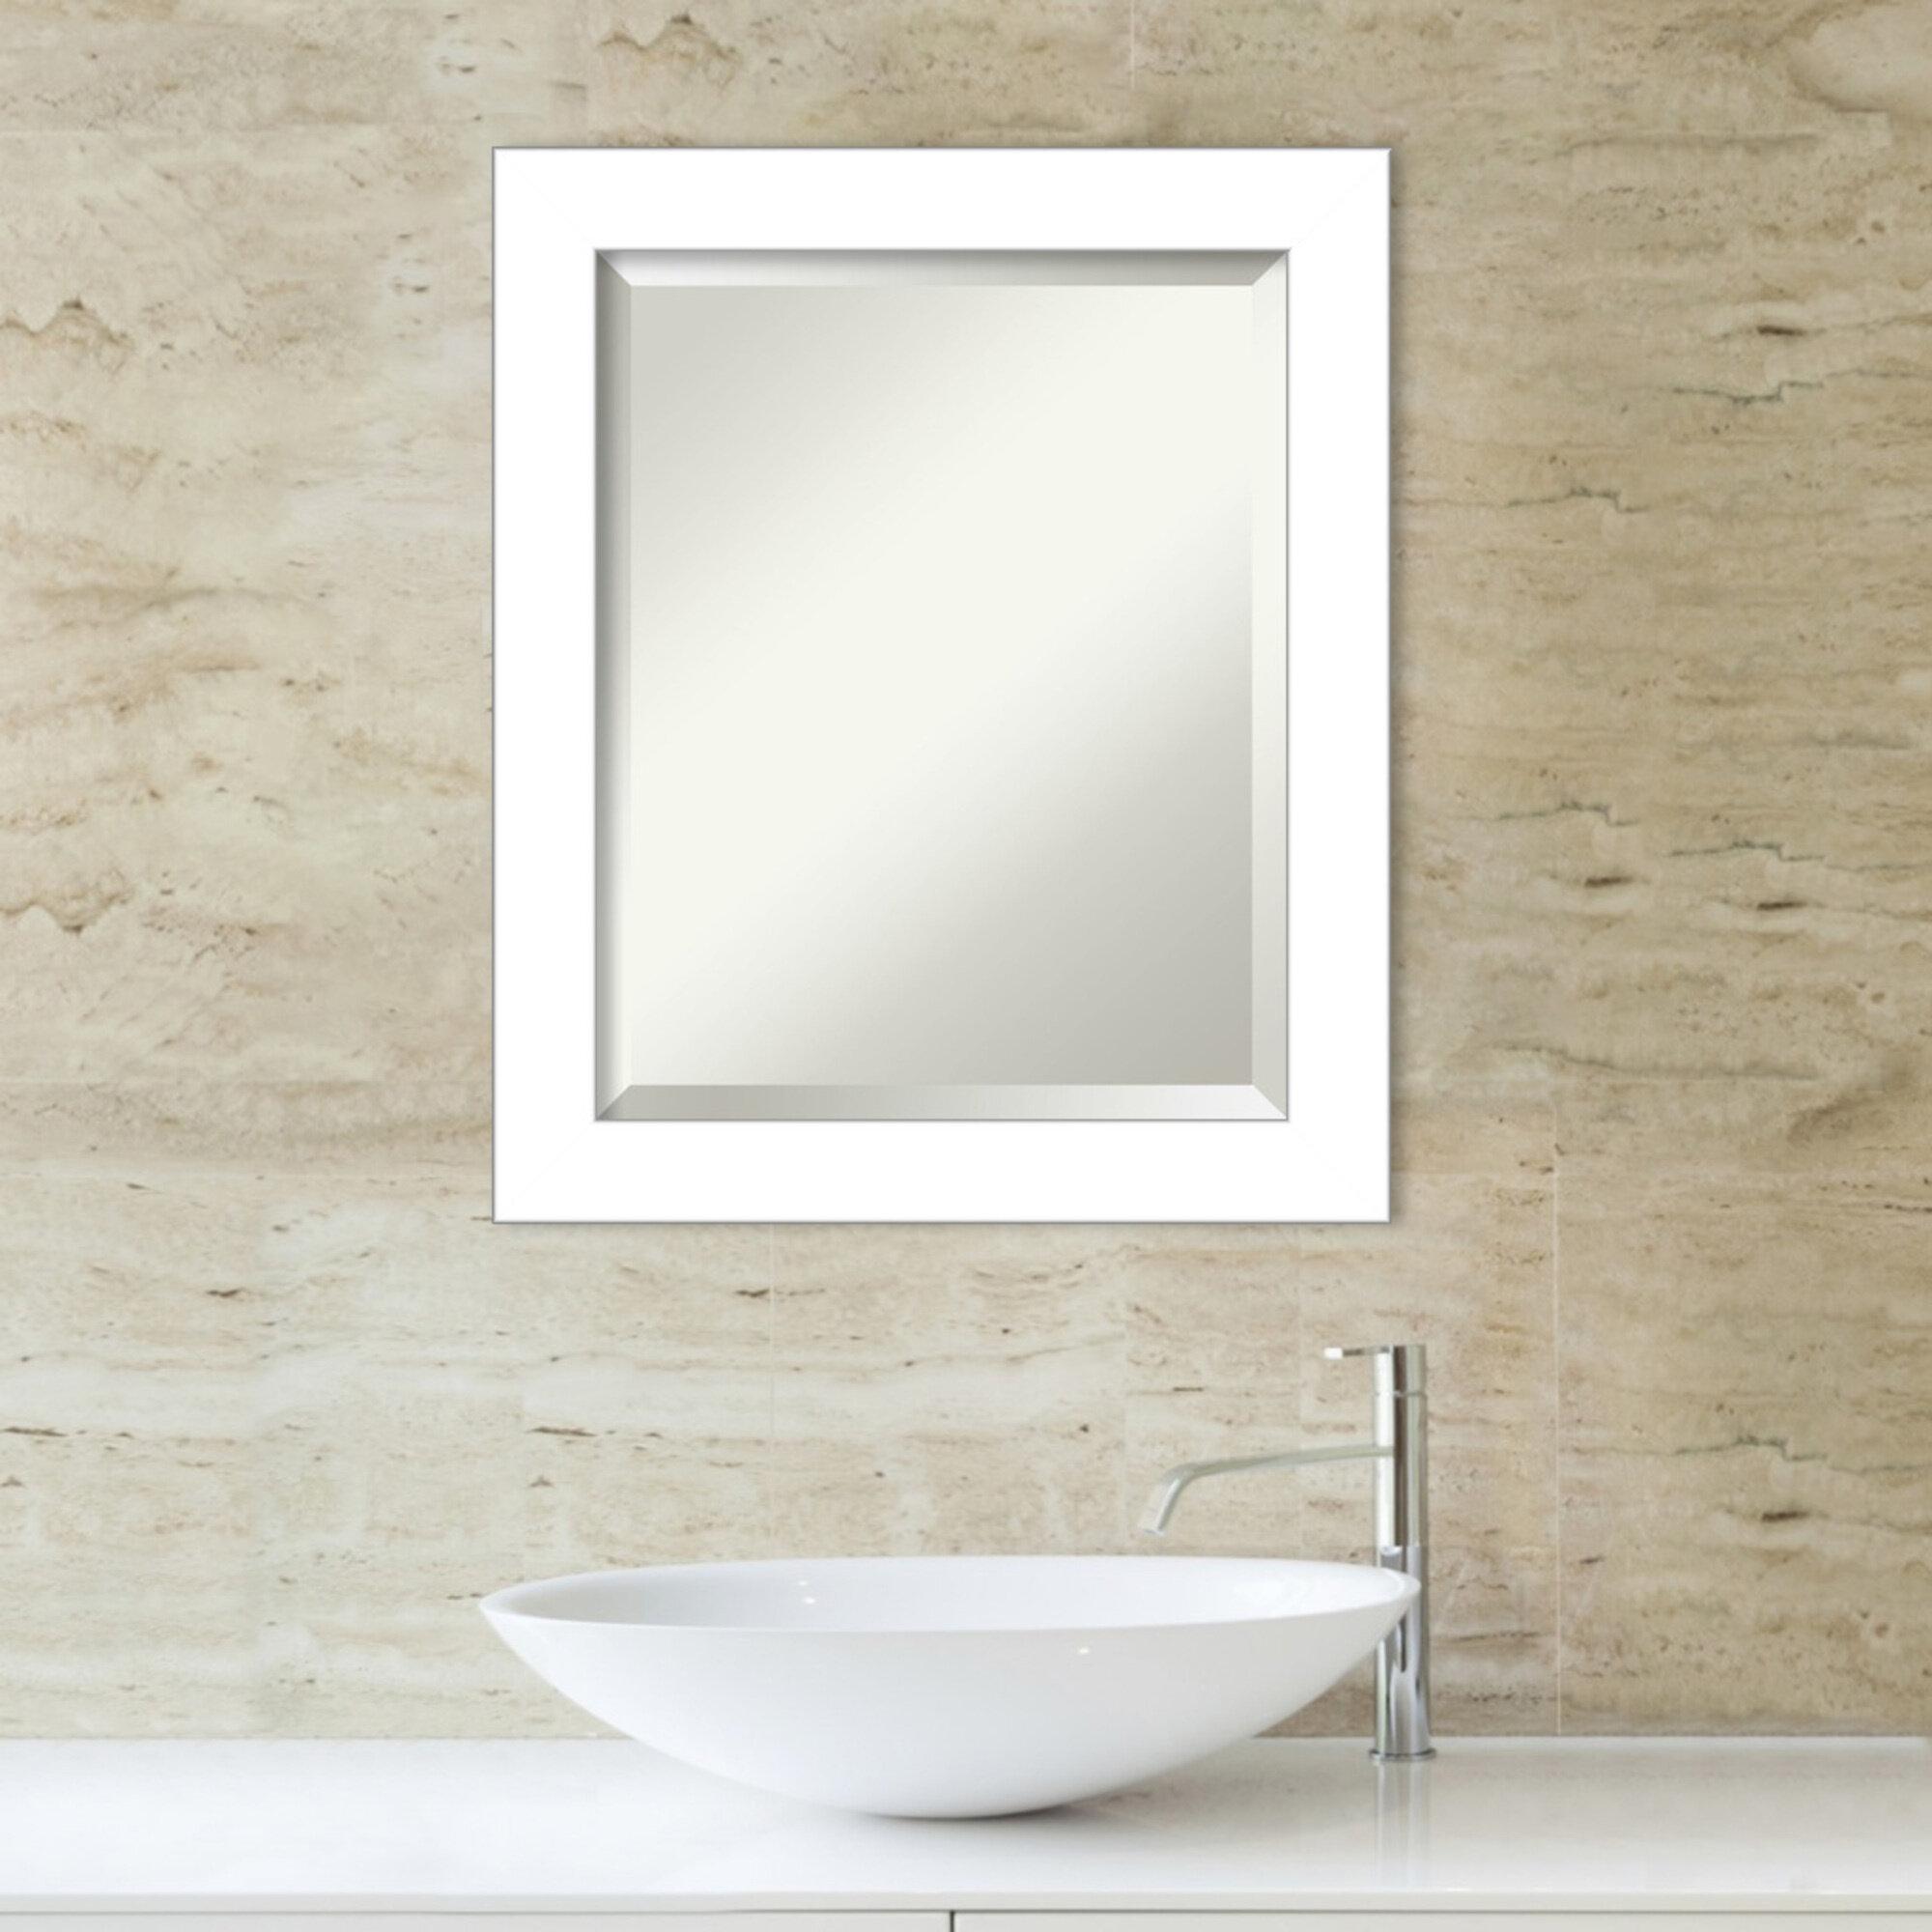 Bathroom Vanity Winston Porter Mirrors You Ll Love In 2021 Wayfair